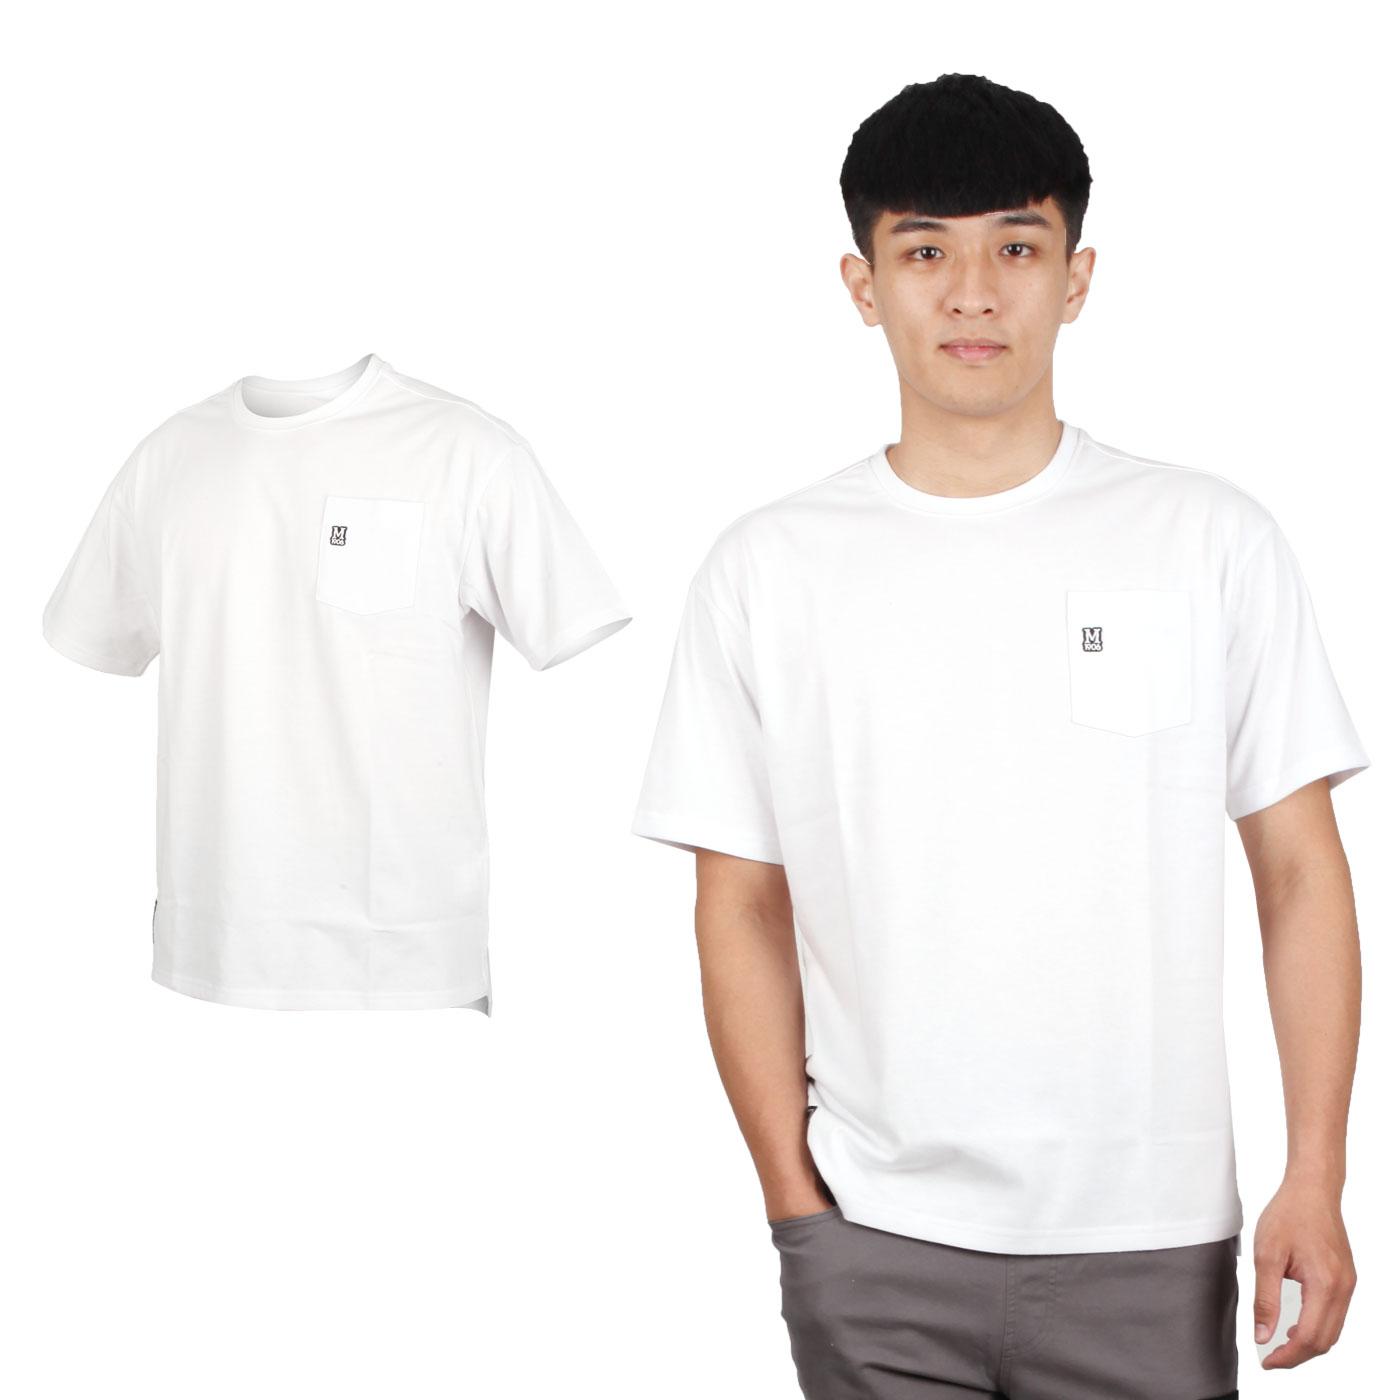 MIZUNO 男款1906系列短袖T恤 D2TA000101 - 白黑